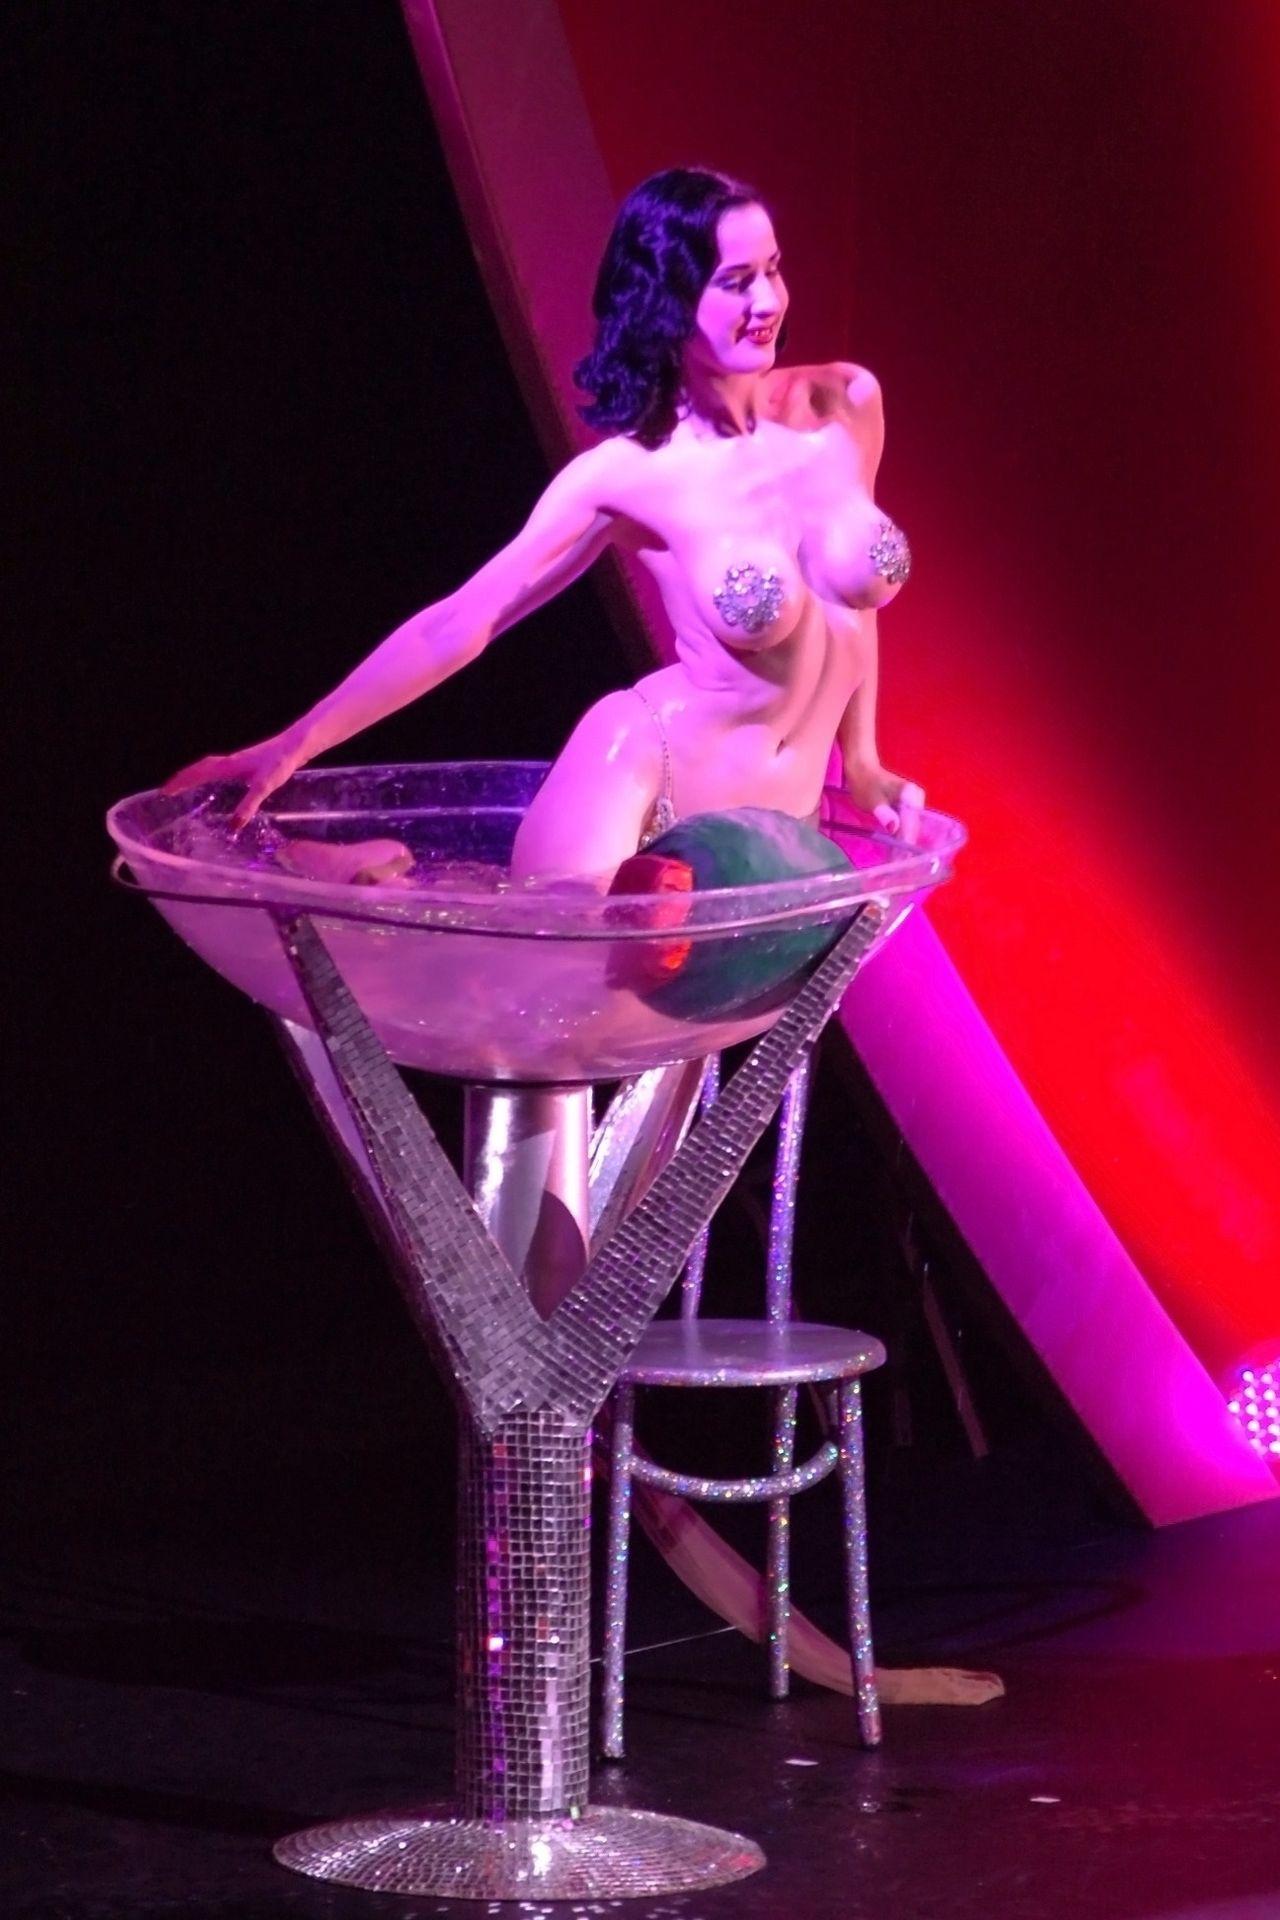 Dita Von Teese Performs At Erotica 06 In London 0034